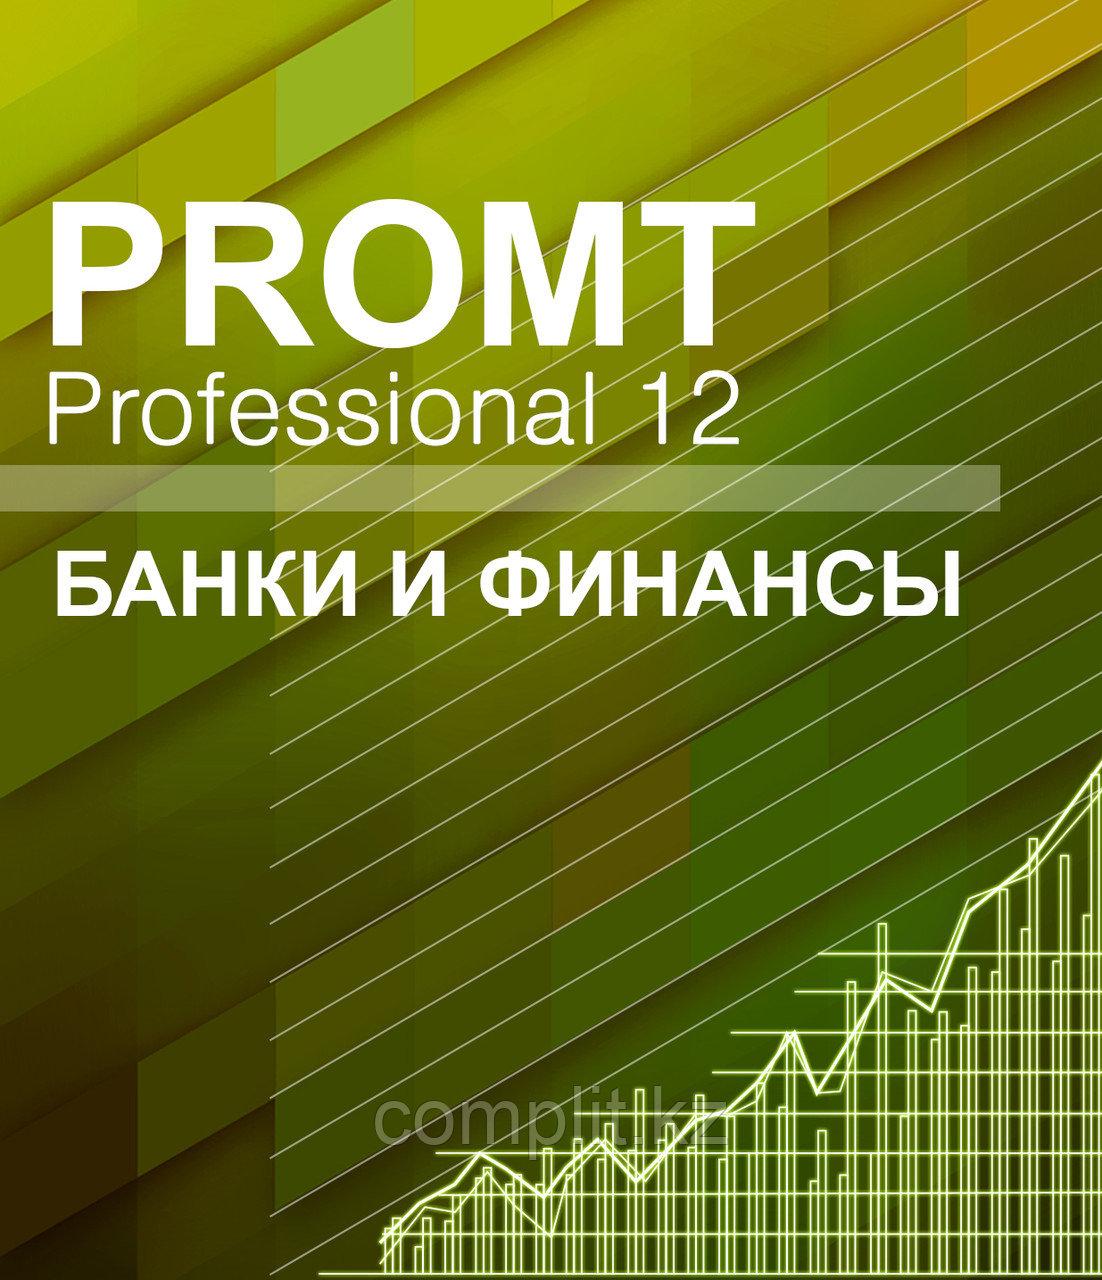 PROMT Professional 12 Банки и финансы